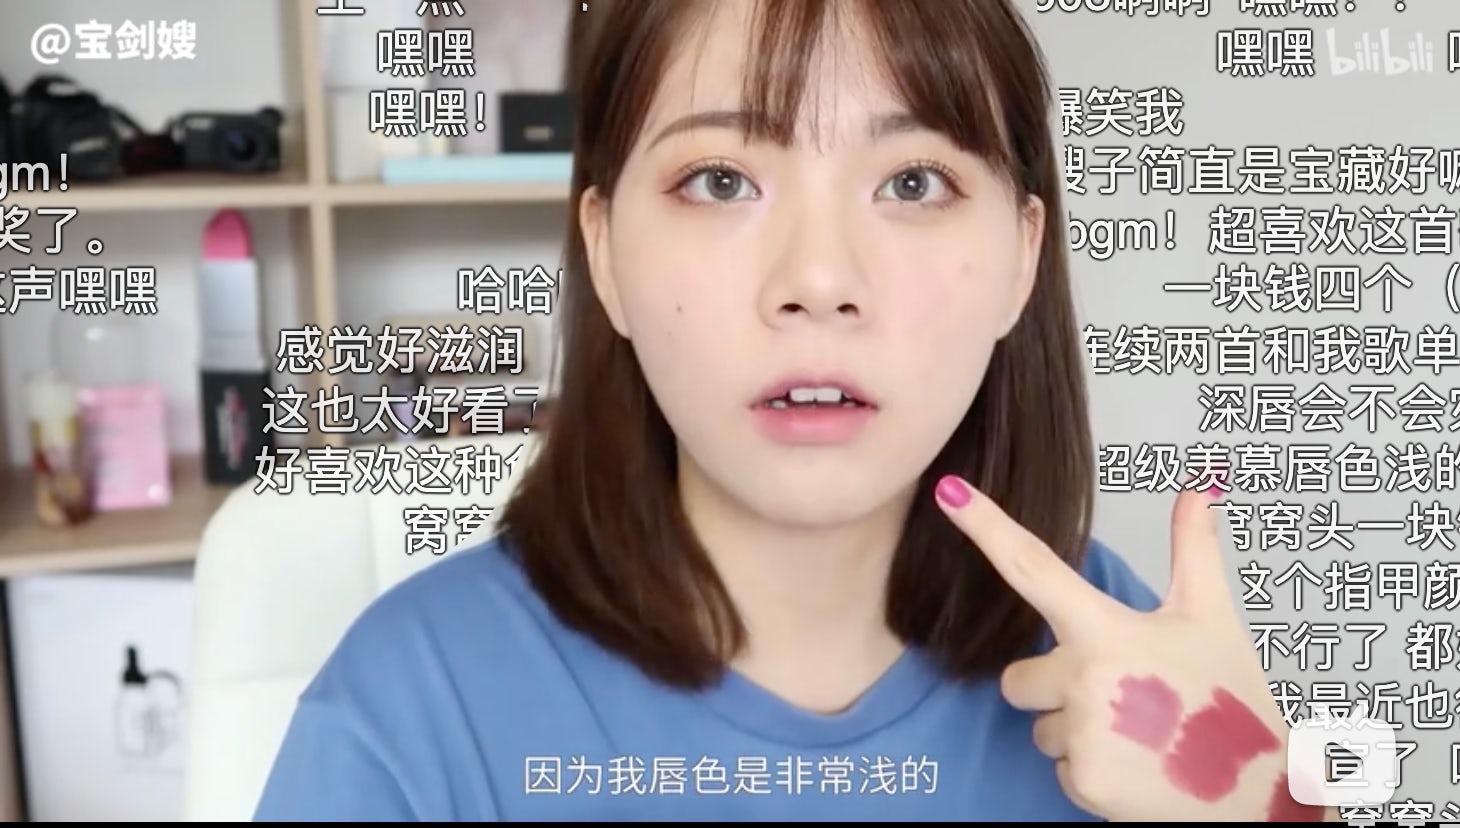 Bilibili KOL Baojiansao reviewing lipsticks. Bilibili.